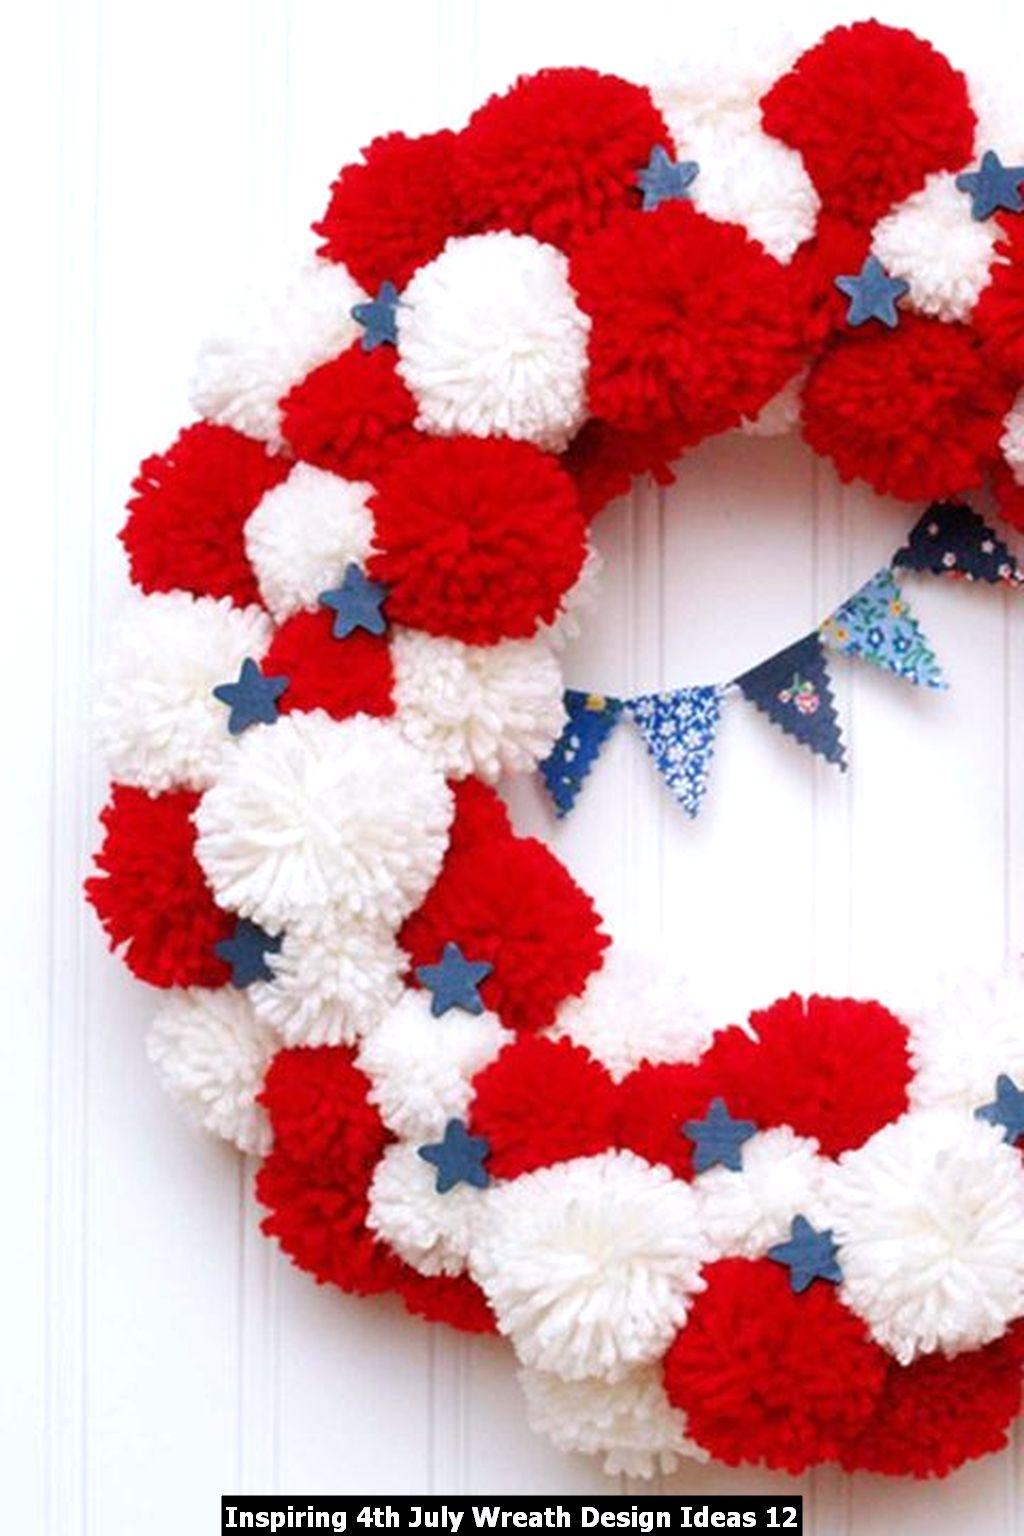 Inspiring 4th July Wreath Design Ideas 12